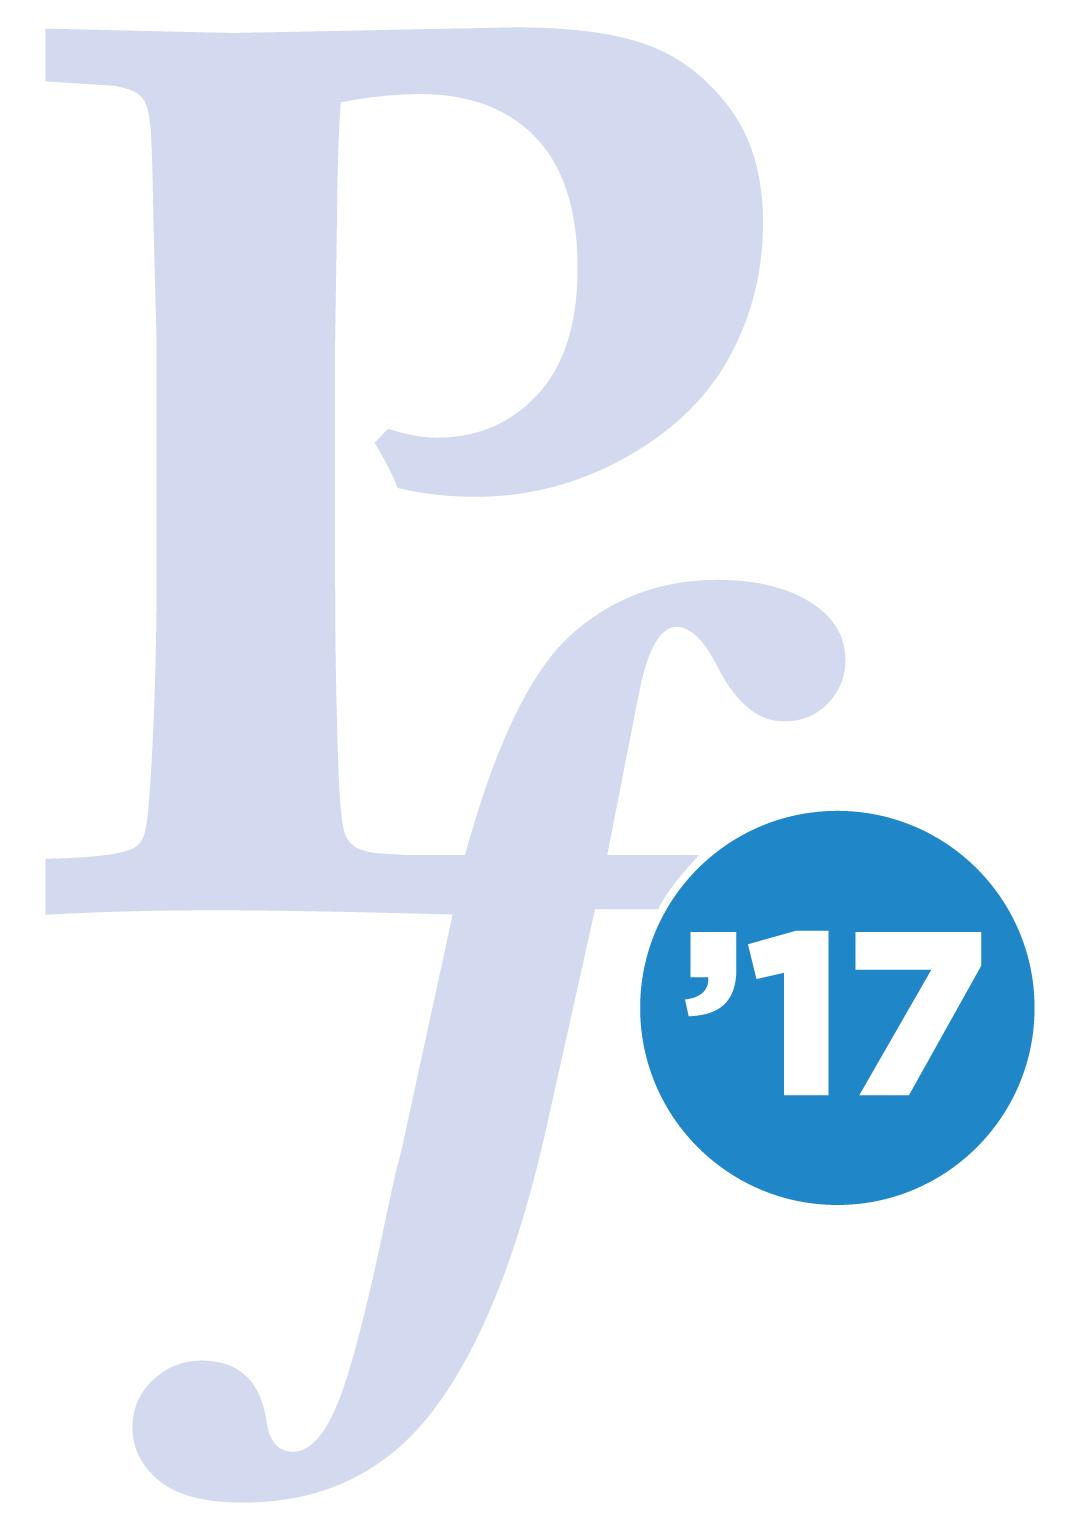 logo pf17